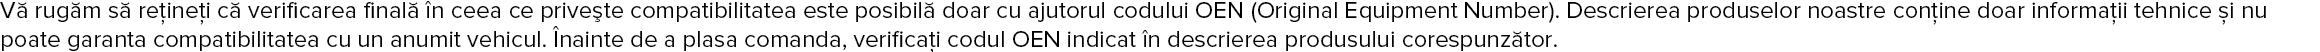 DENSO 31916-KRM-841, 31916-KRM-8413, 31916-KRM-8413-M1, 31916-KYT-9010, 31916-KYT-9010-M1 Bujii